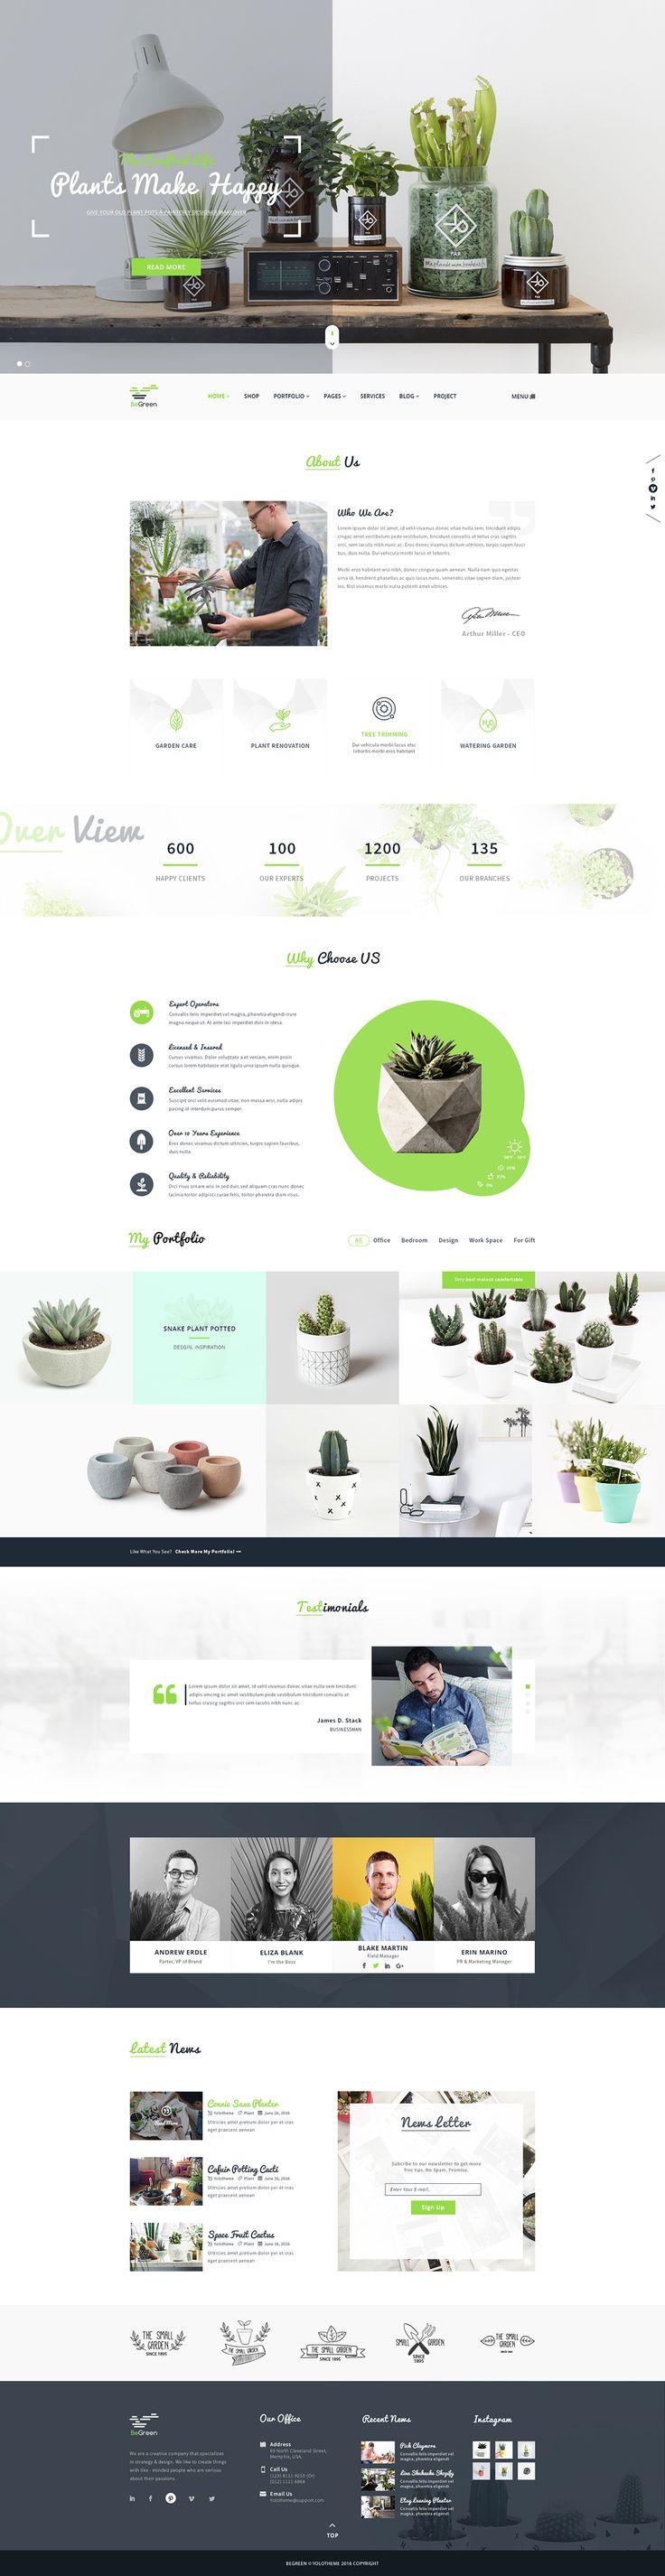 BeGreen - Multipurpose Planter PSD Template on Behance